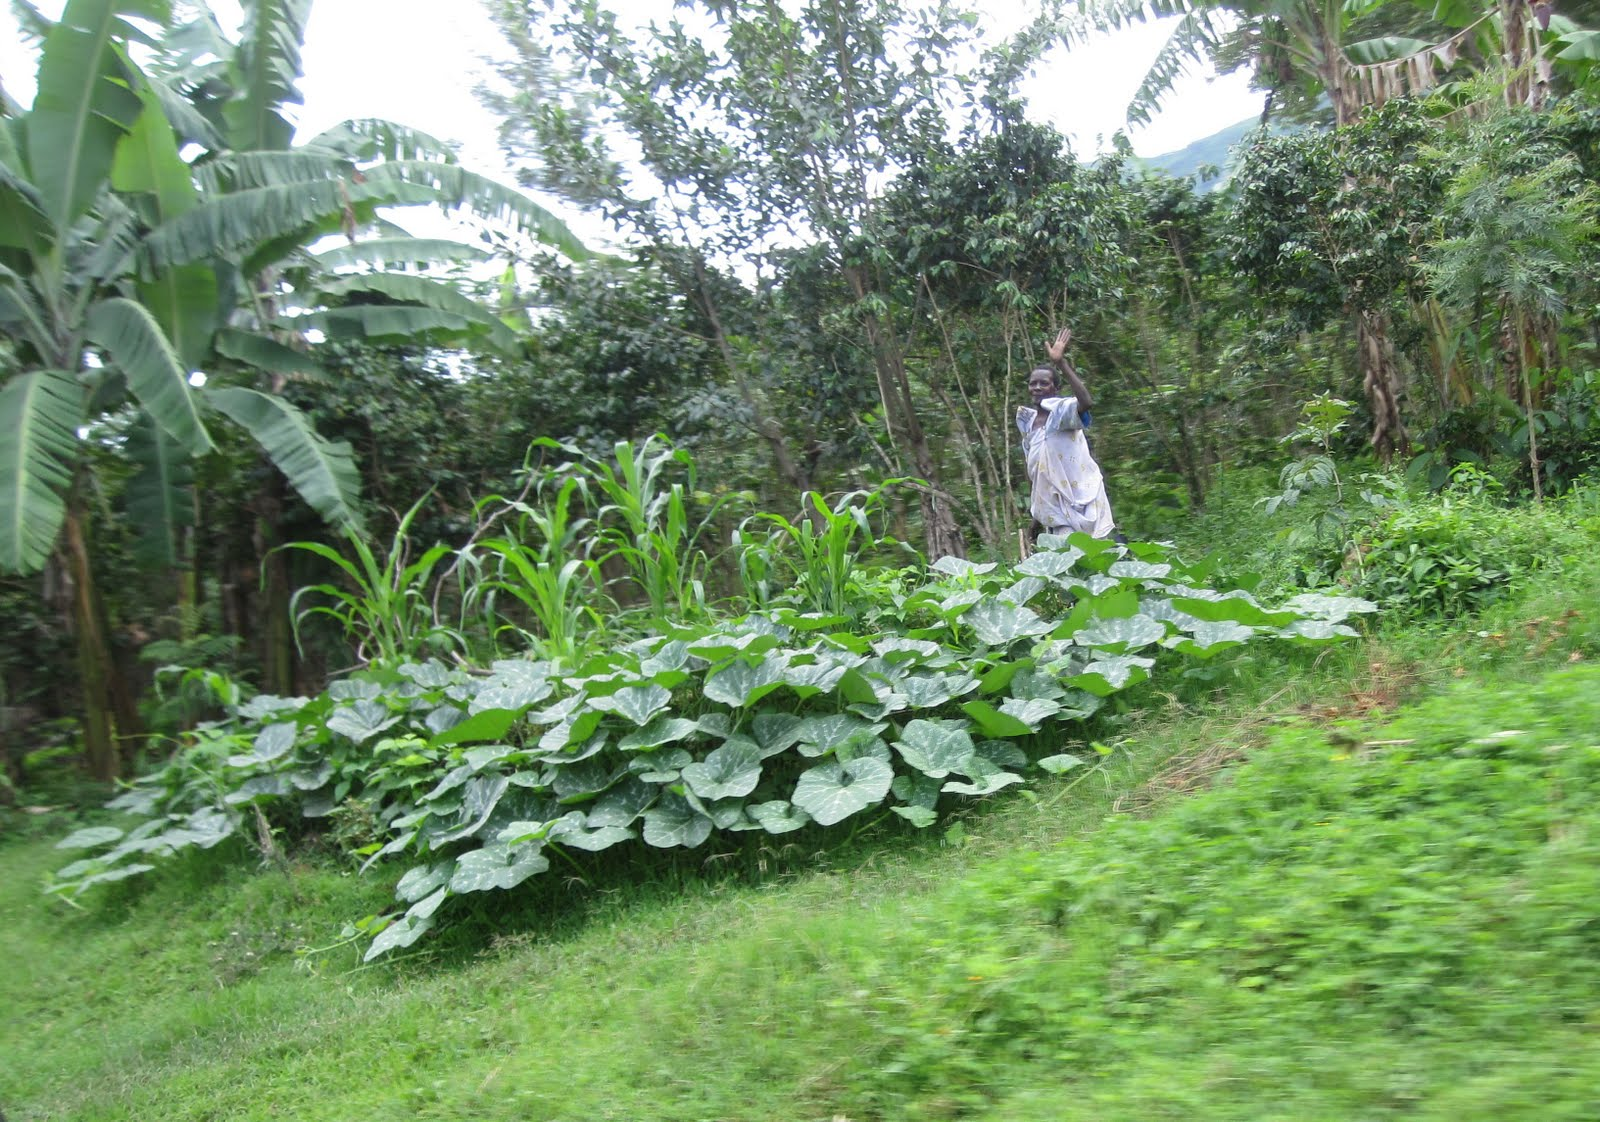 The Barlows In Uganda Mbale The Garden Of Eden Of Uganda